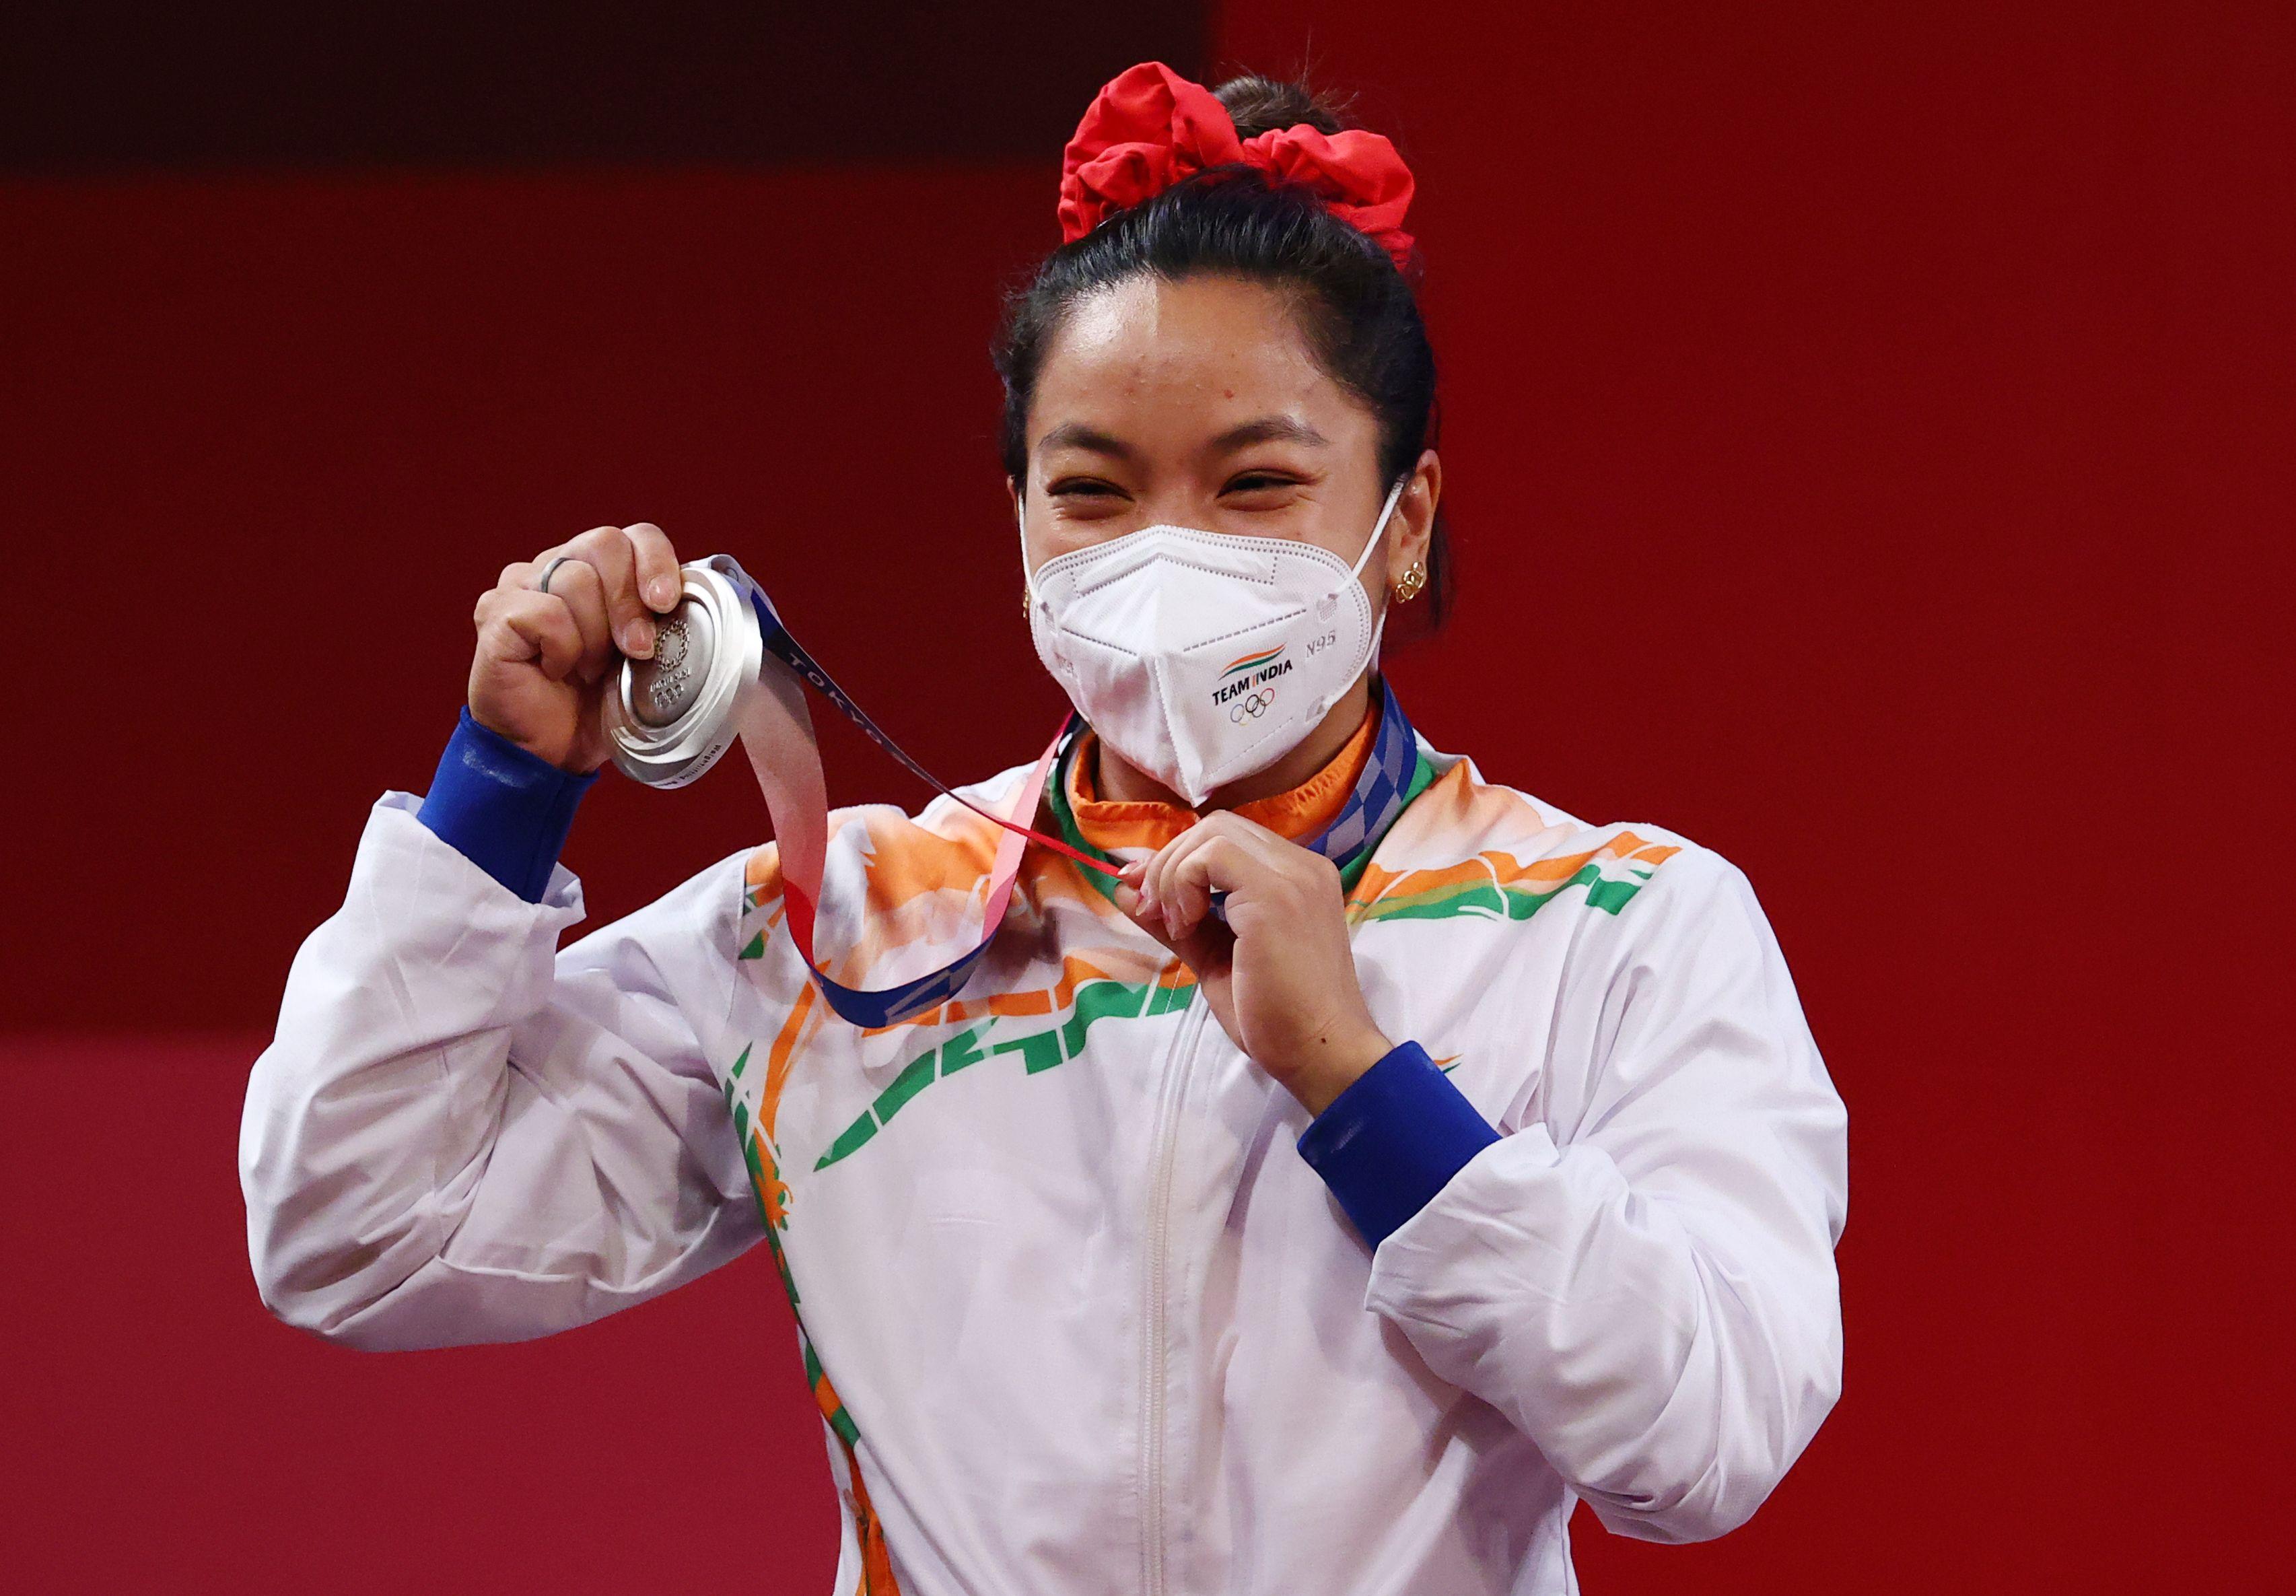 Tokyo 2020 Olympics - Weightlifting - Women's 49kg - Medal Ceremony - Tokyo International Forum, Tokyo, Japan - July 24, 2021. Silver medalist Mirabai Chanu Saikhom of India reacts. REUTERS/Edgard Garrido